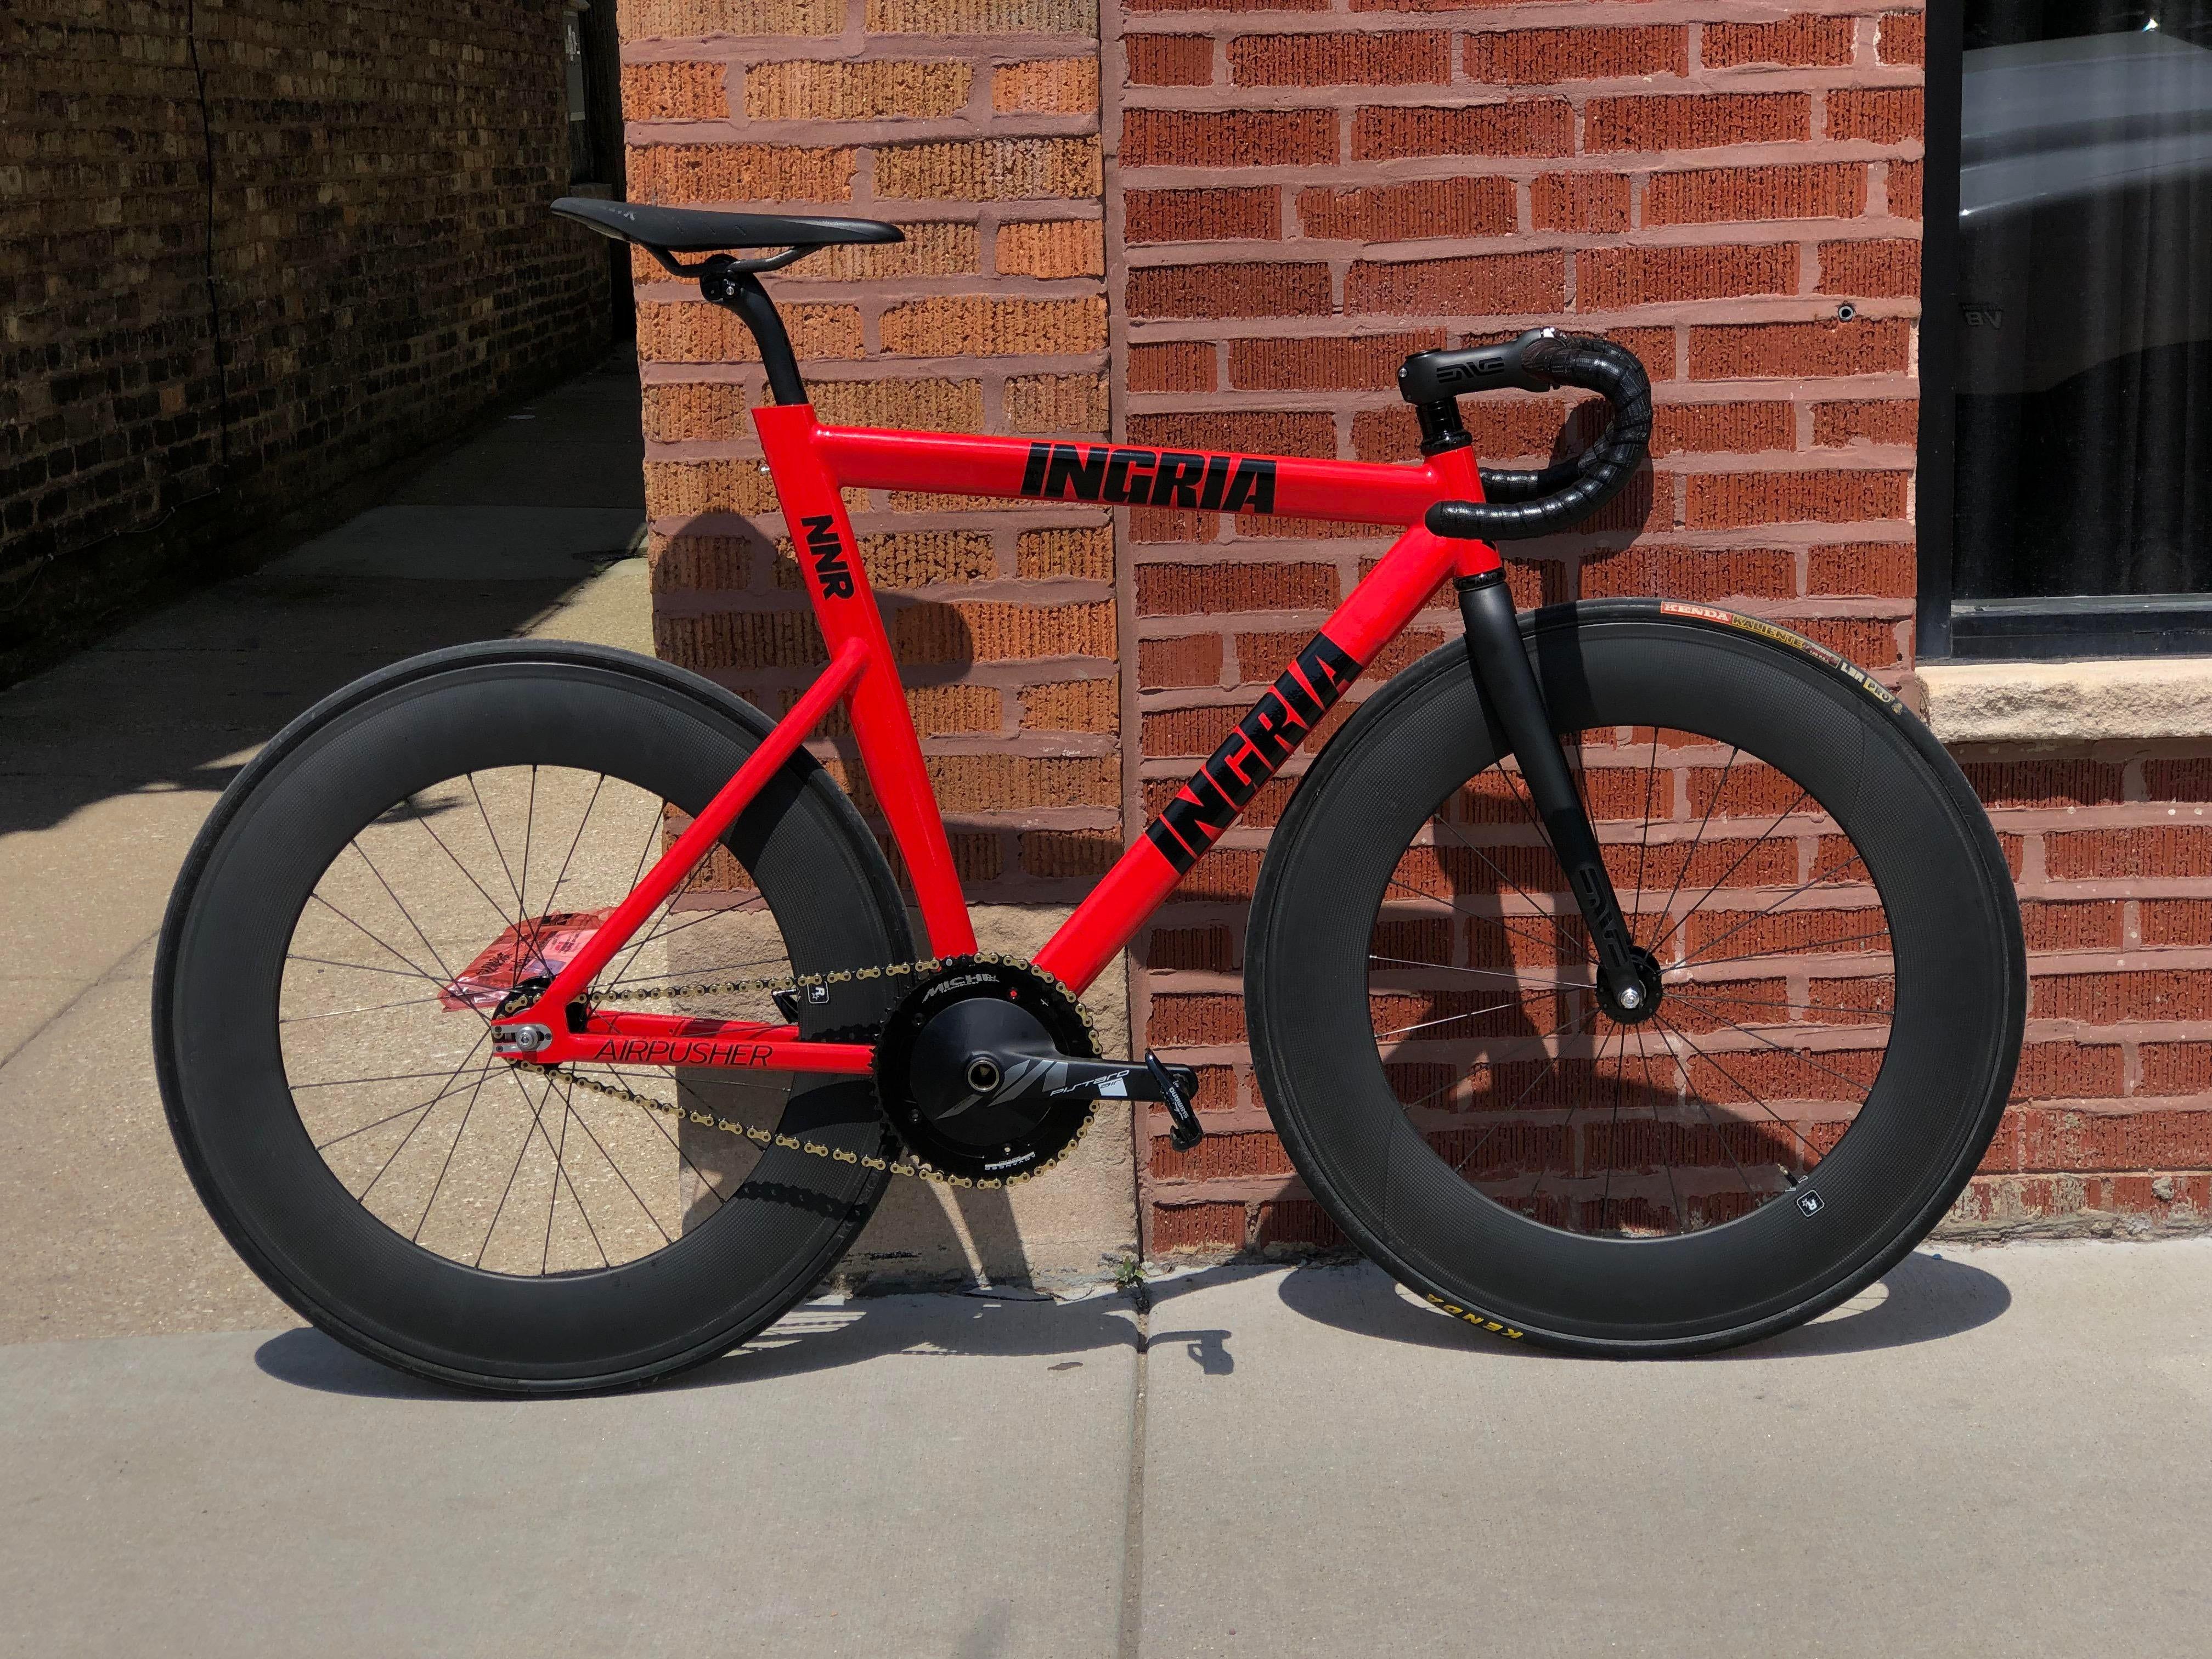 Ingria Airpusher Fixedgearbicycle Fixie Bike Fixed Gear